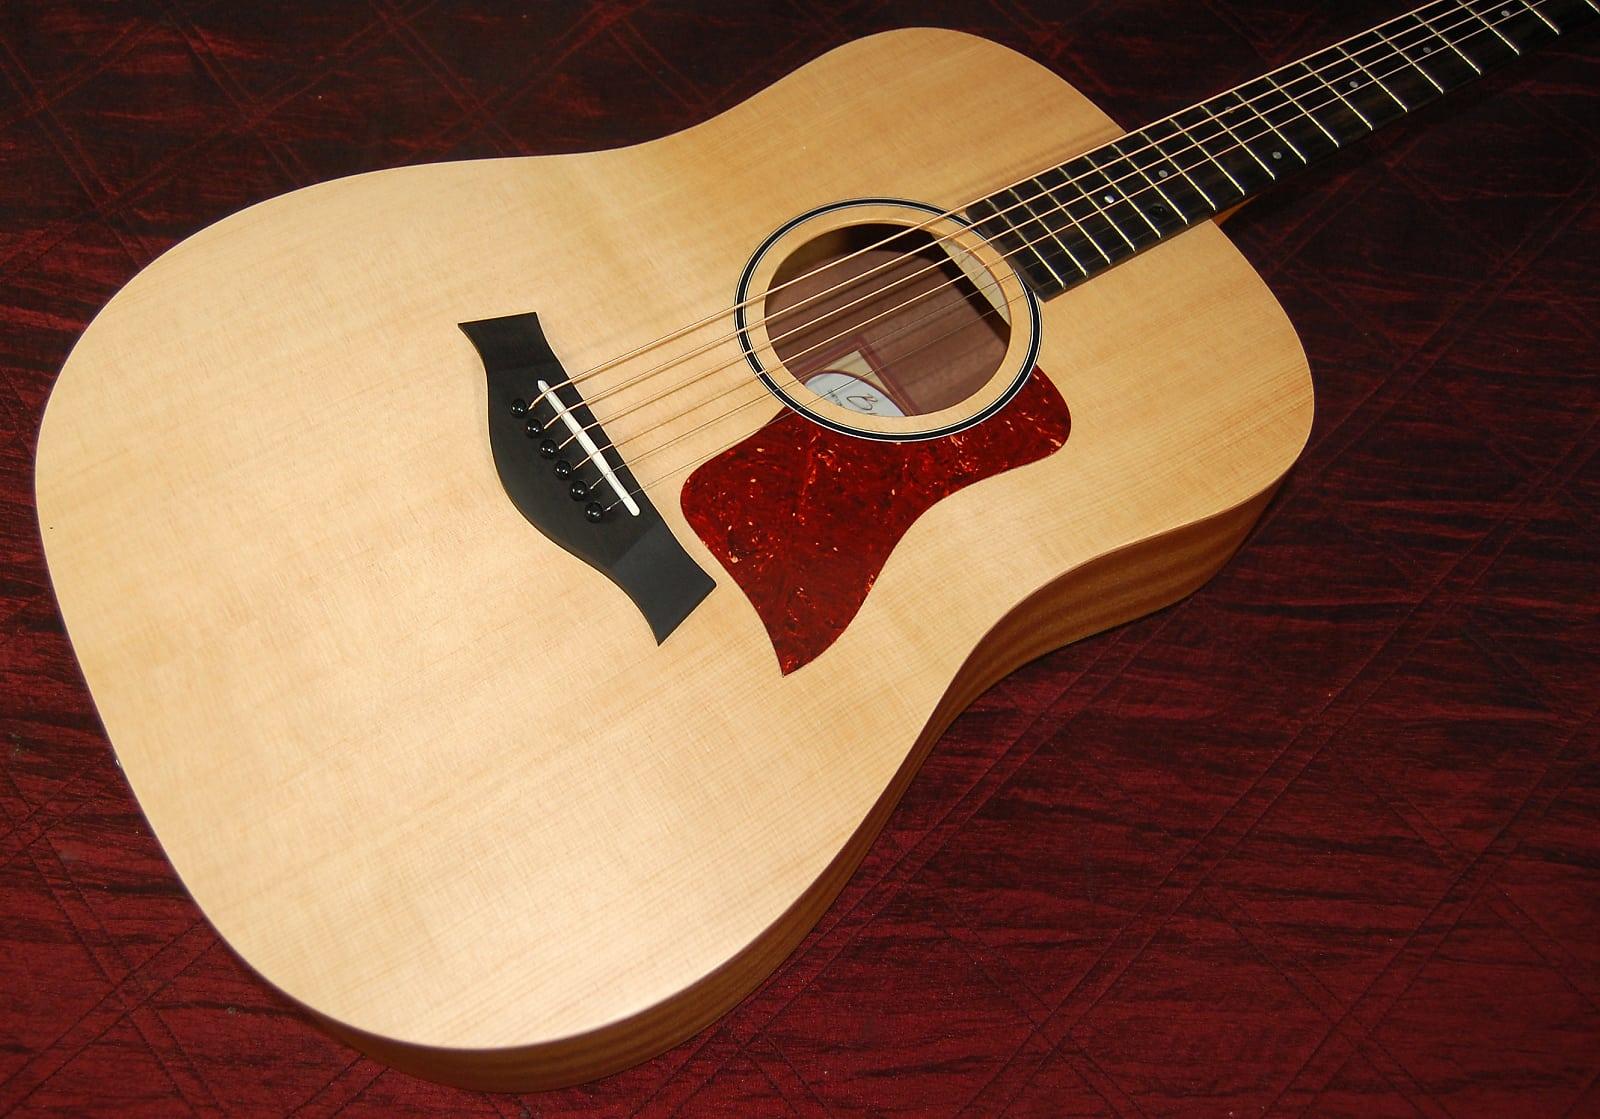 2018 Taylor BBT Big Baby Taylor Acoustic Guitar Natural Finish - Mint!  Authorized Dealer SAVE!